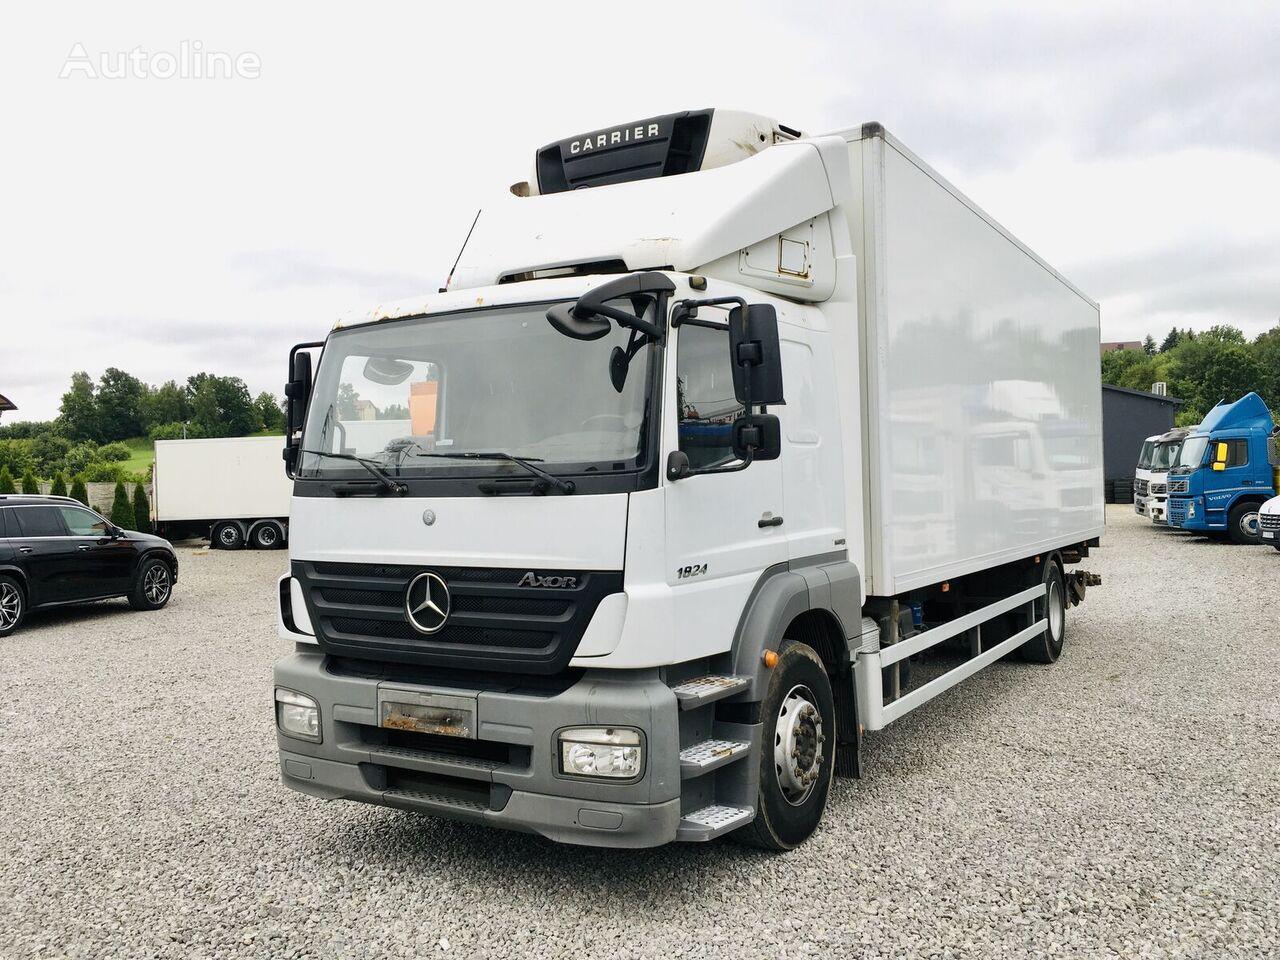 MERCEDES-BENZ Axor 1824 Euro 5 , sypialna kabina refrigerated truck